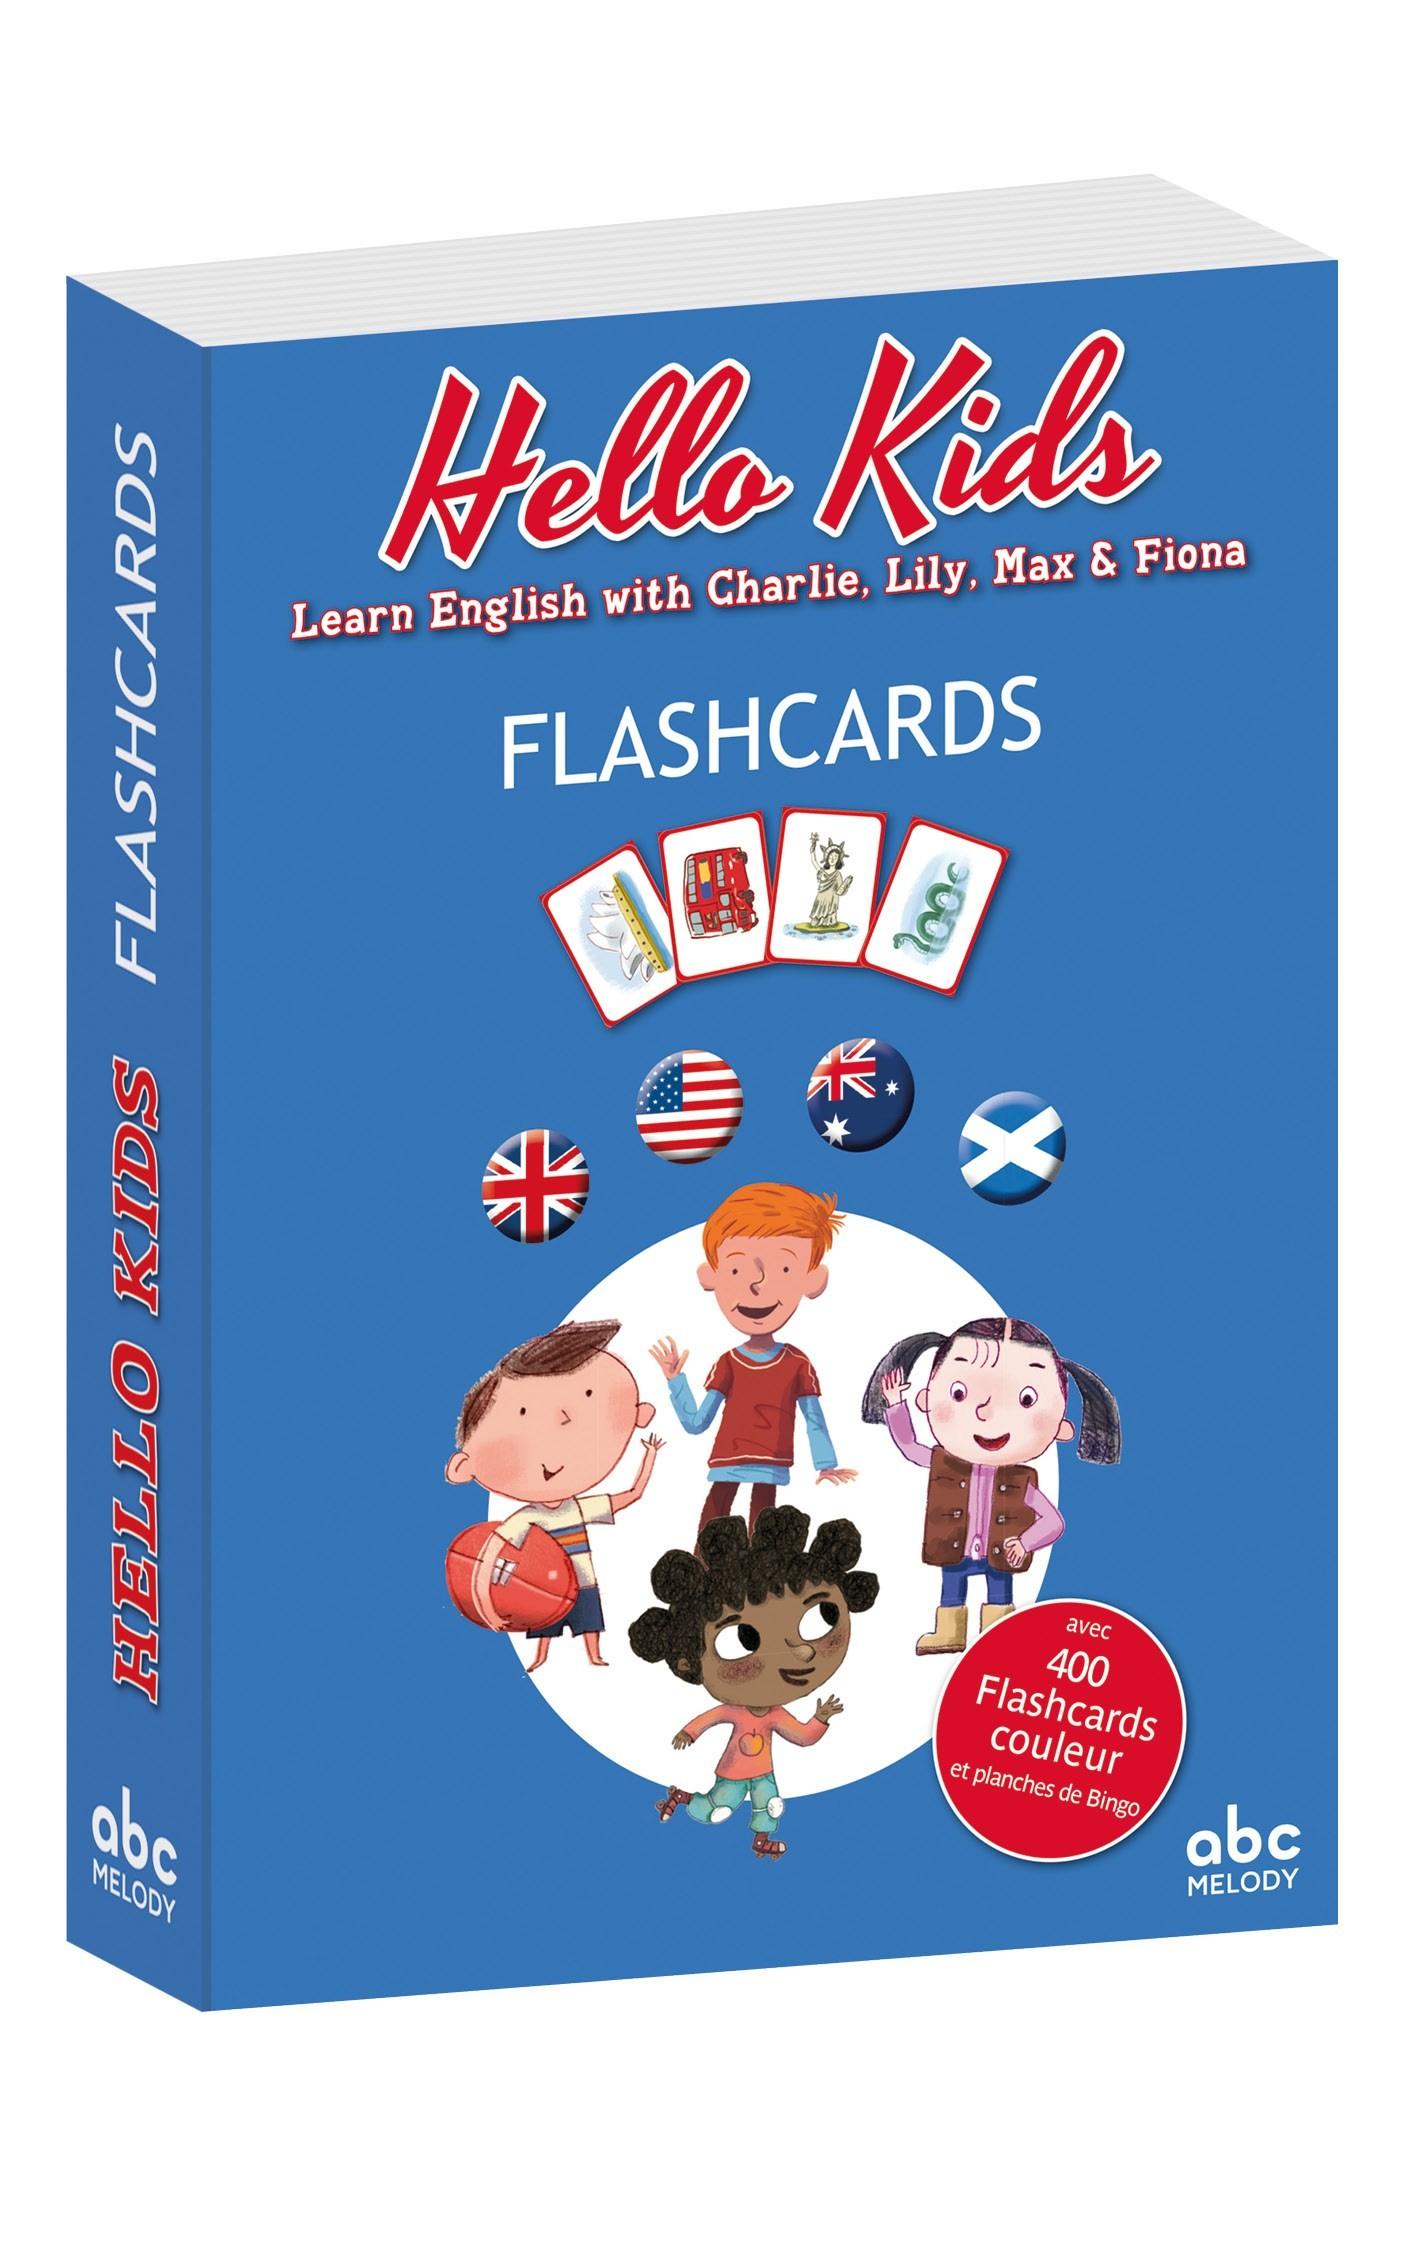 HELLO KIDS FLASHCARDS / LIVRES CD / ABC MELODY